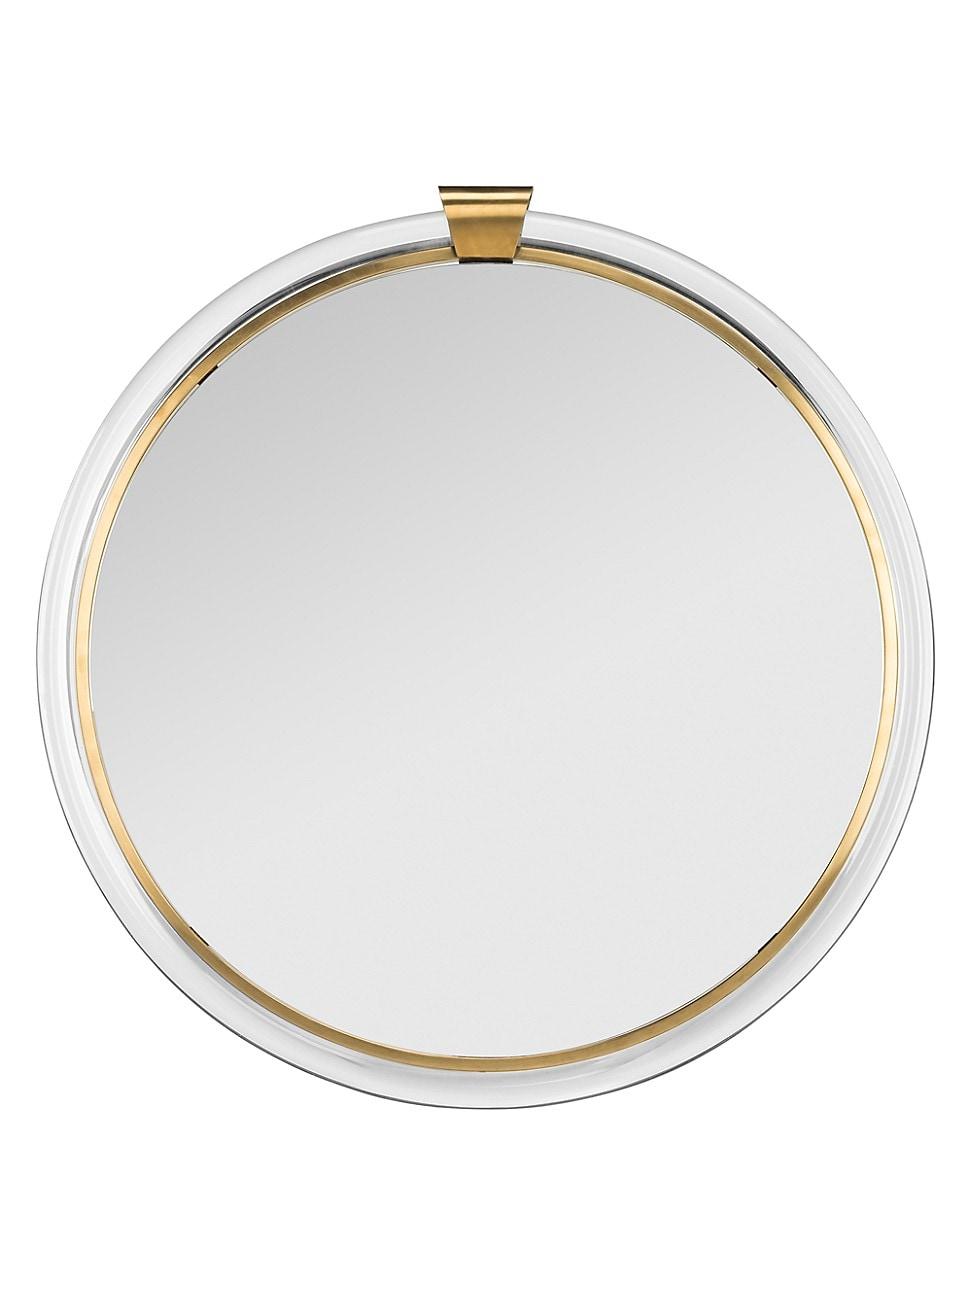 Safavieh Donzel Acrylic Mirror In Brass